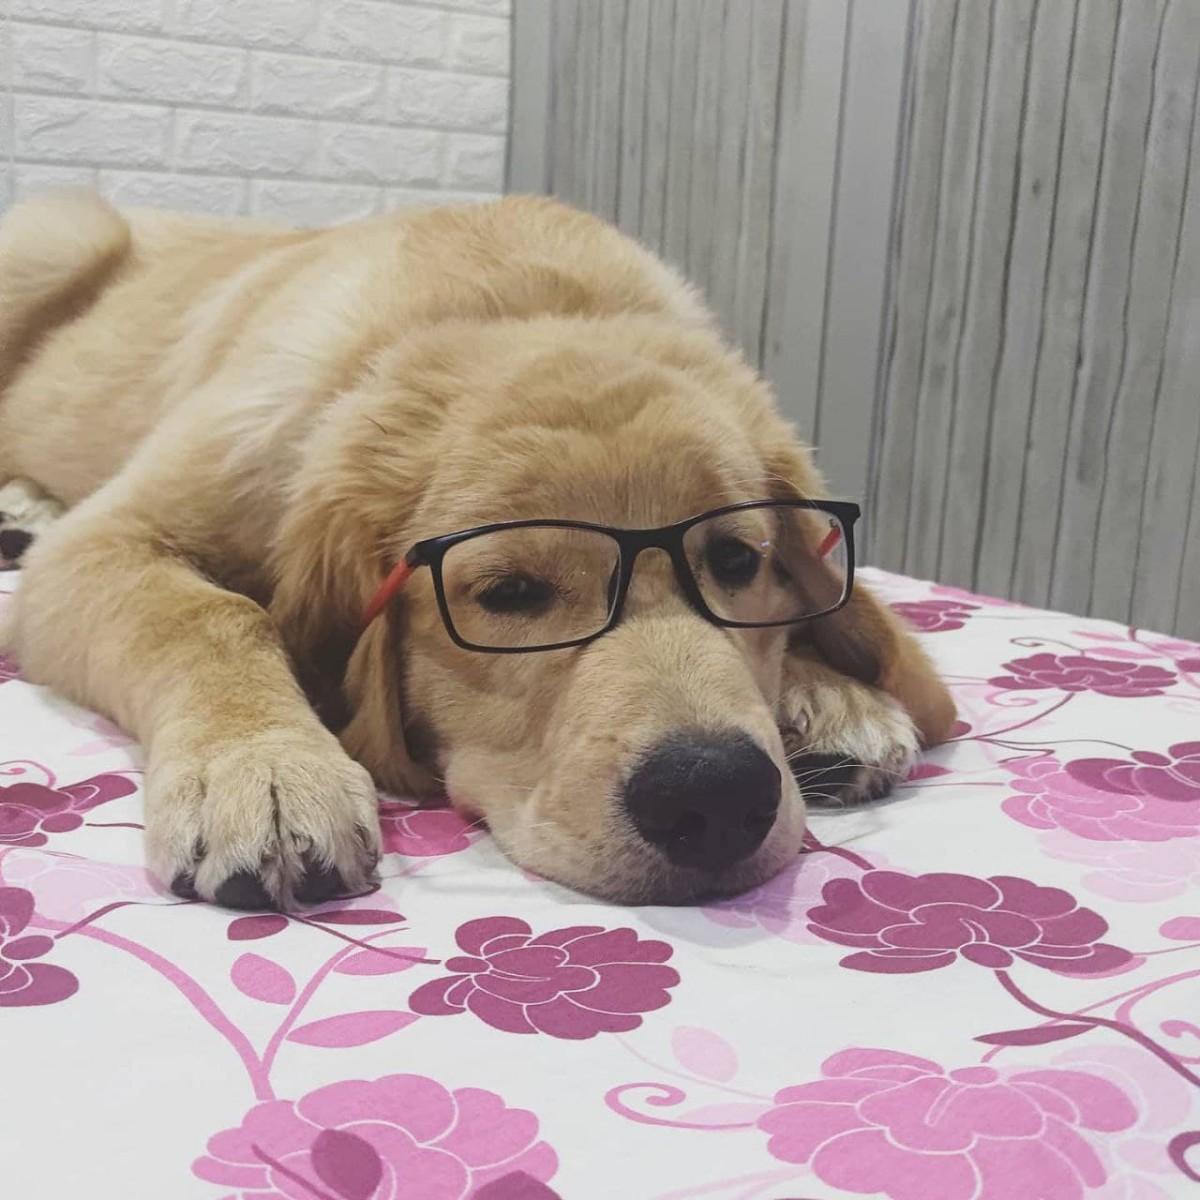 Austin wearing Glasses